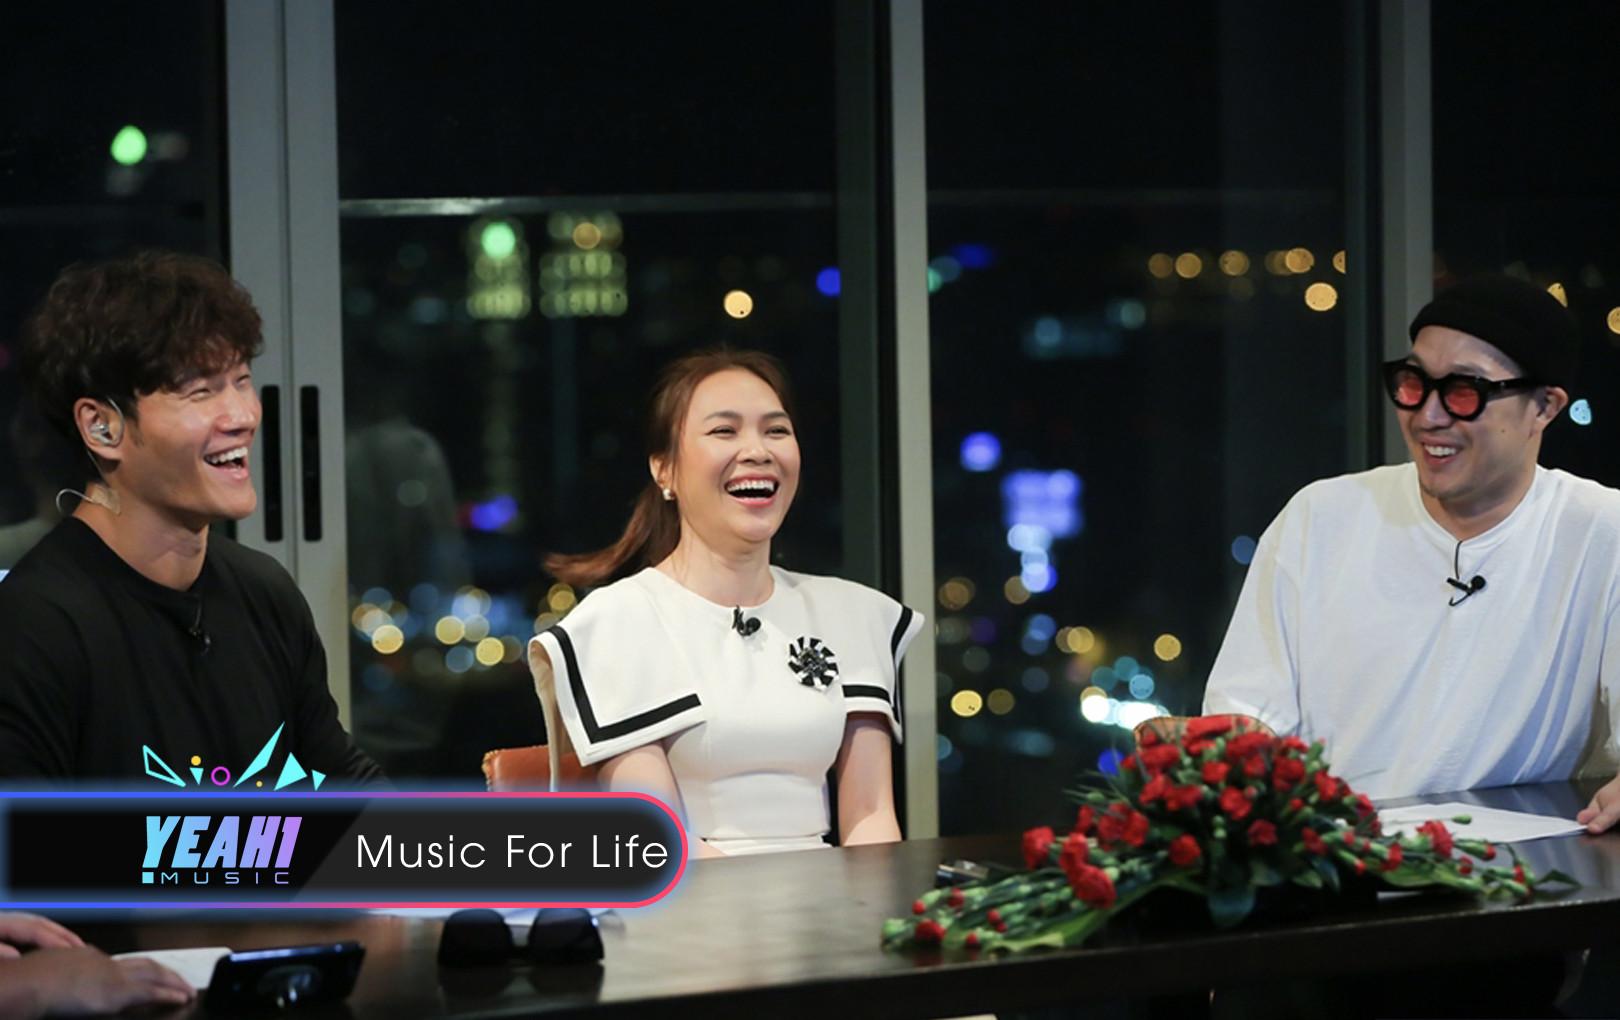 Tp.HCM đẹp lung linh trong teaser show mới của Kim Jong Kook, HaHa